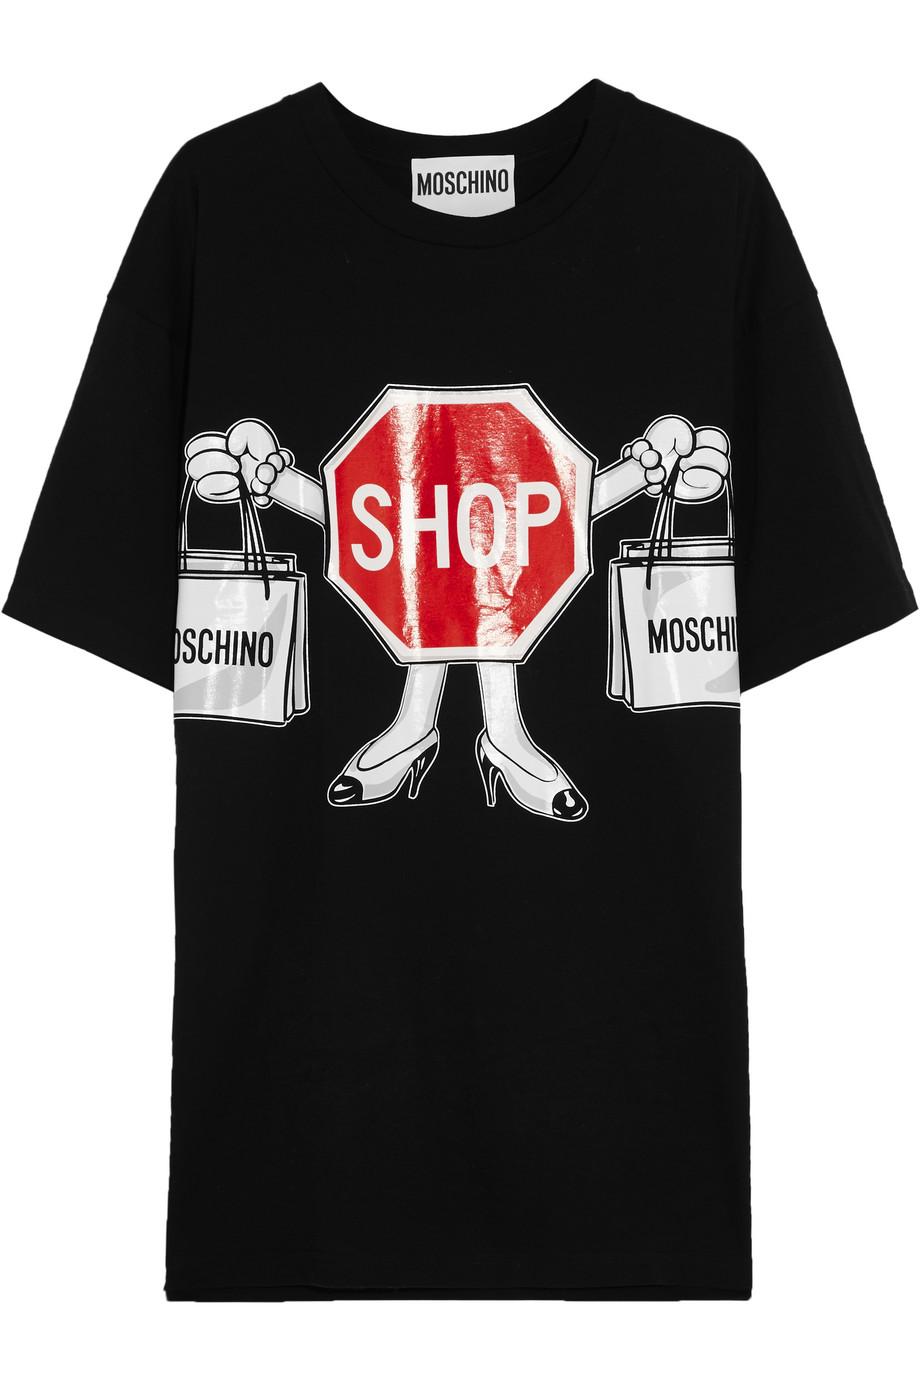 Moschino Printed Cotton-Jersey T-Shirt, Black, Women's, Size: 42